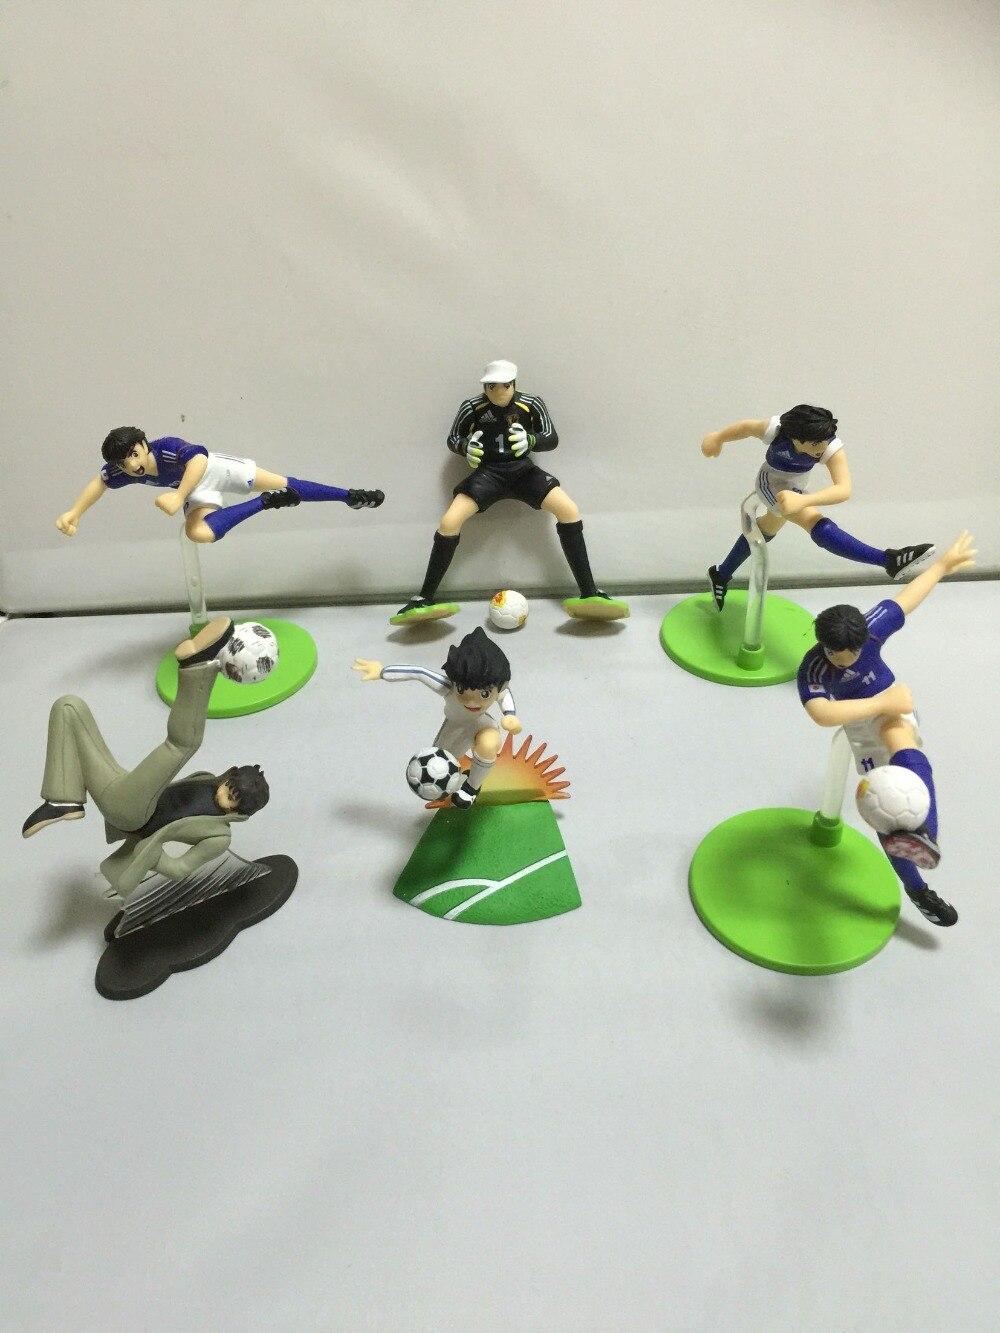 pvc figure japan football boy, 6pcs/set free shipping 6pcs cute garen xinzhao jarvaniv ezreal leesin sona pvc action figure style keyring key chains 6pcs per set